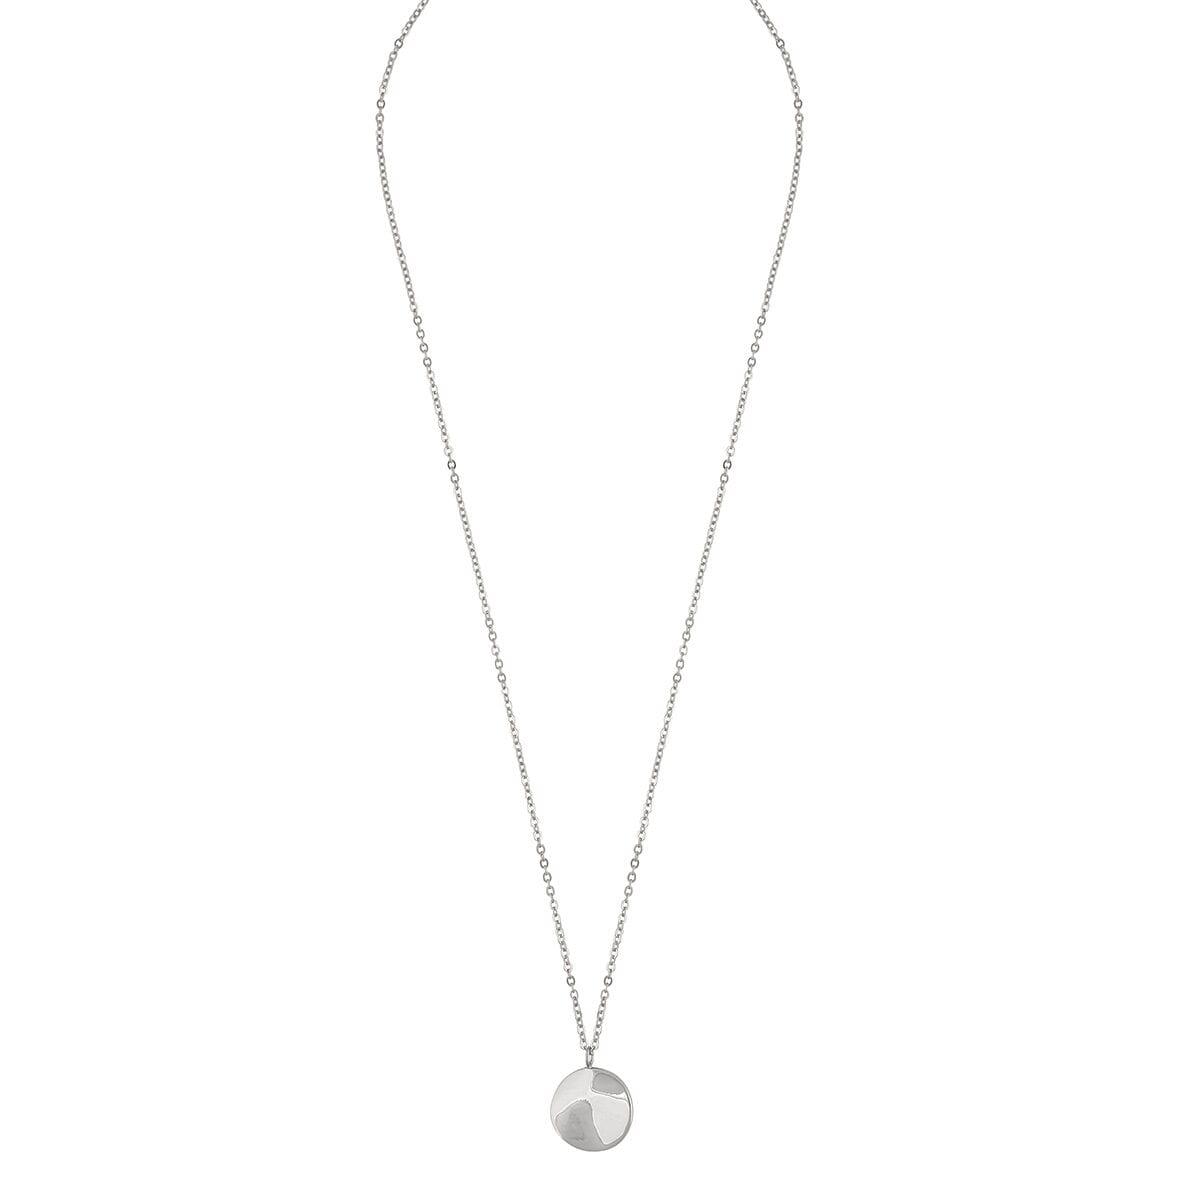 1006-2201256-Phoebe-small-pendant-neck-42-plain-s